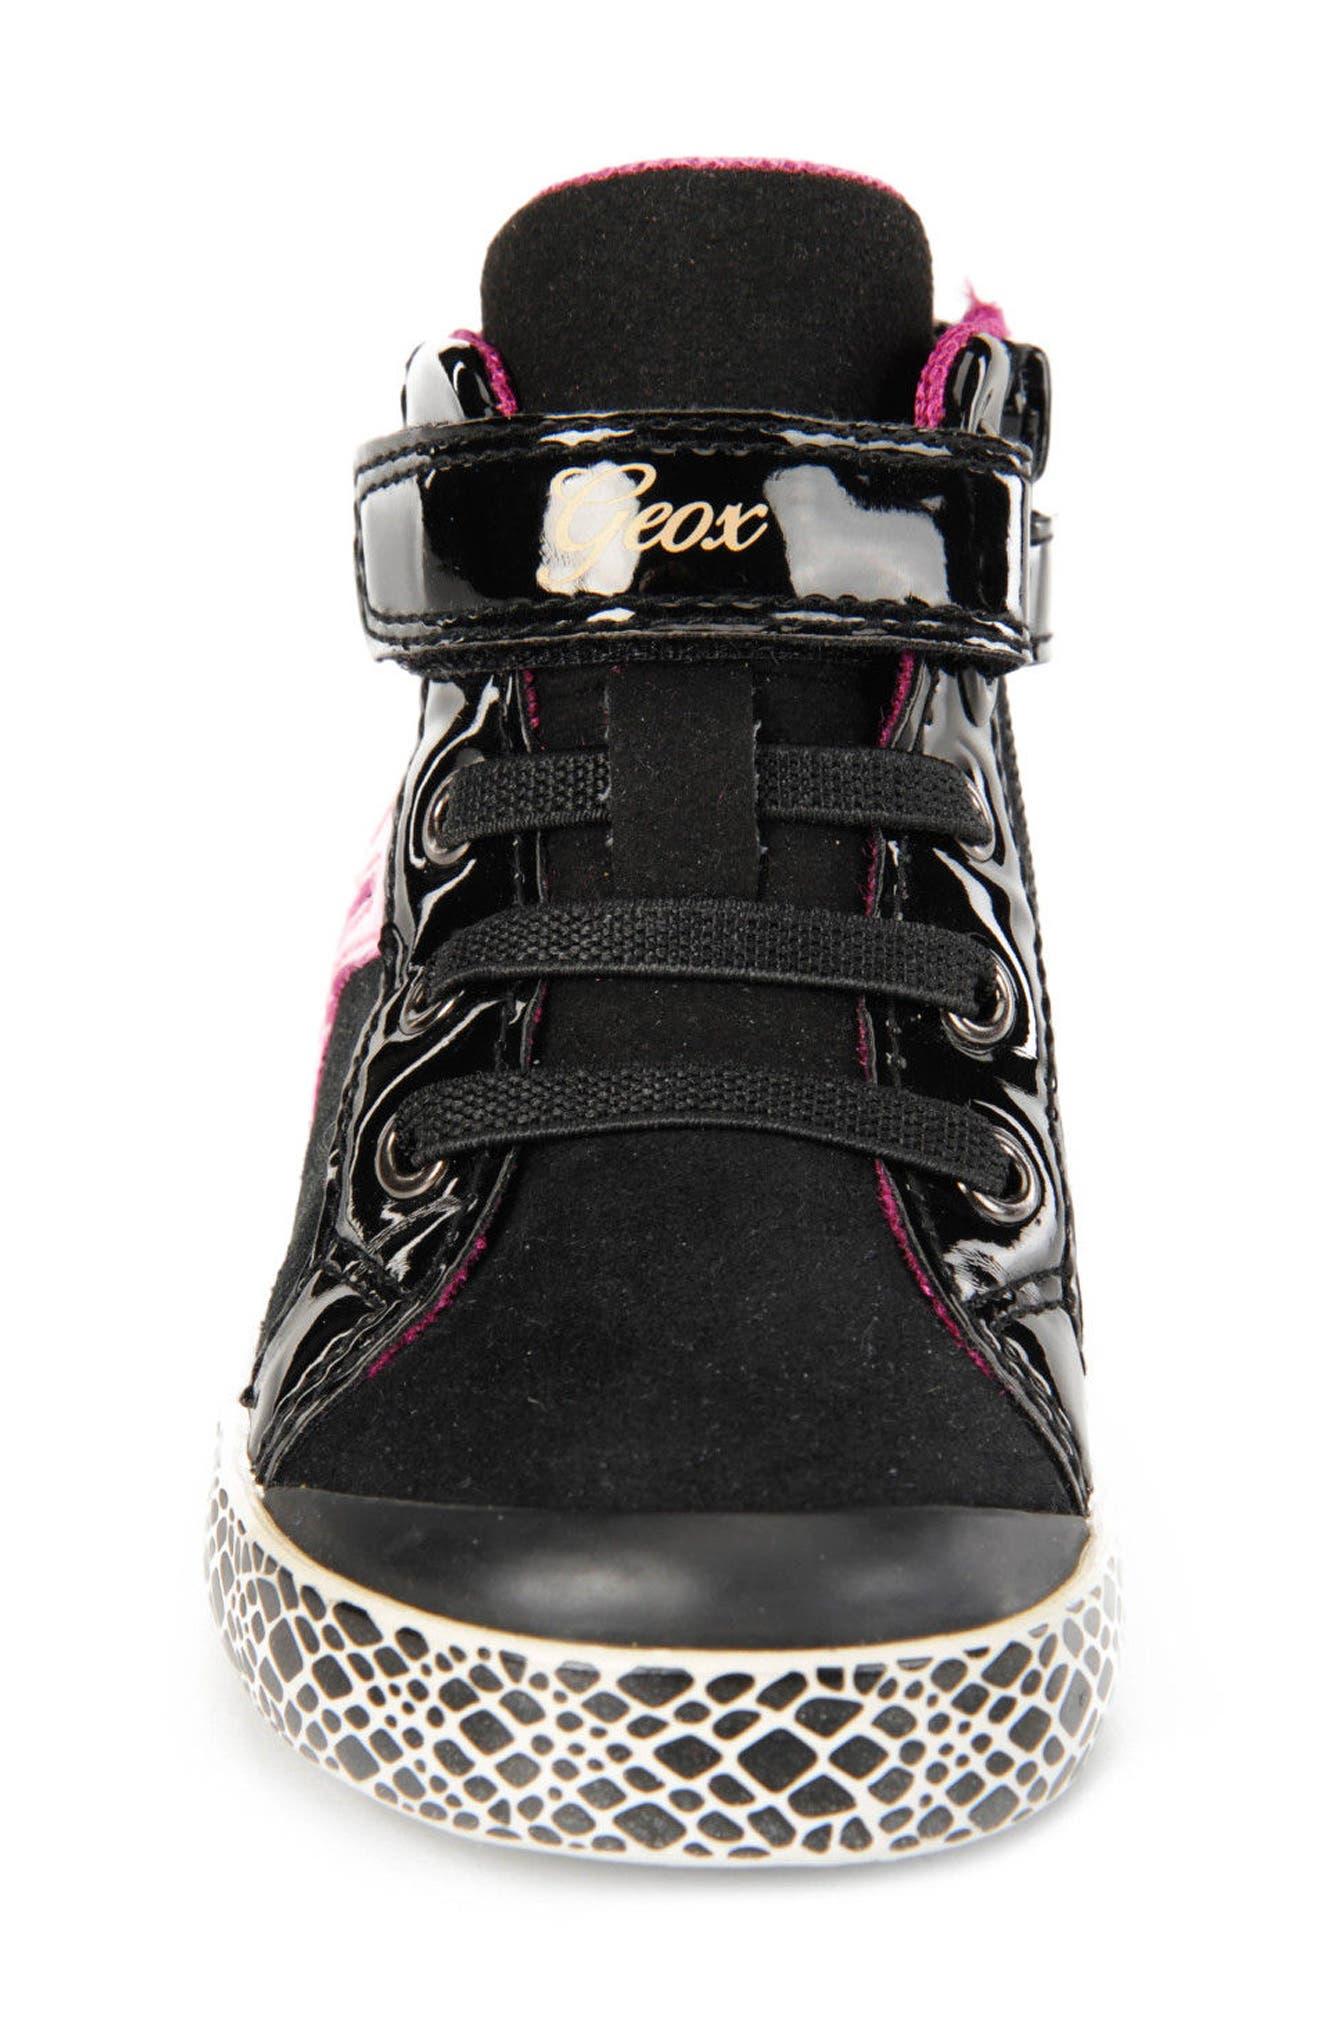 Kiwi Girl High Top Sneaker,                             Alternate thumbnail 4, color,                             Black/ Cyclamen